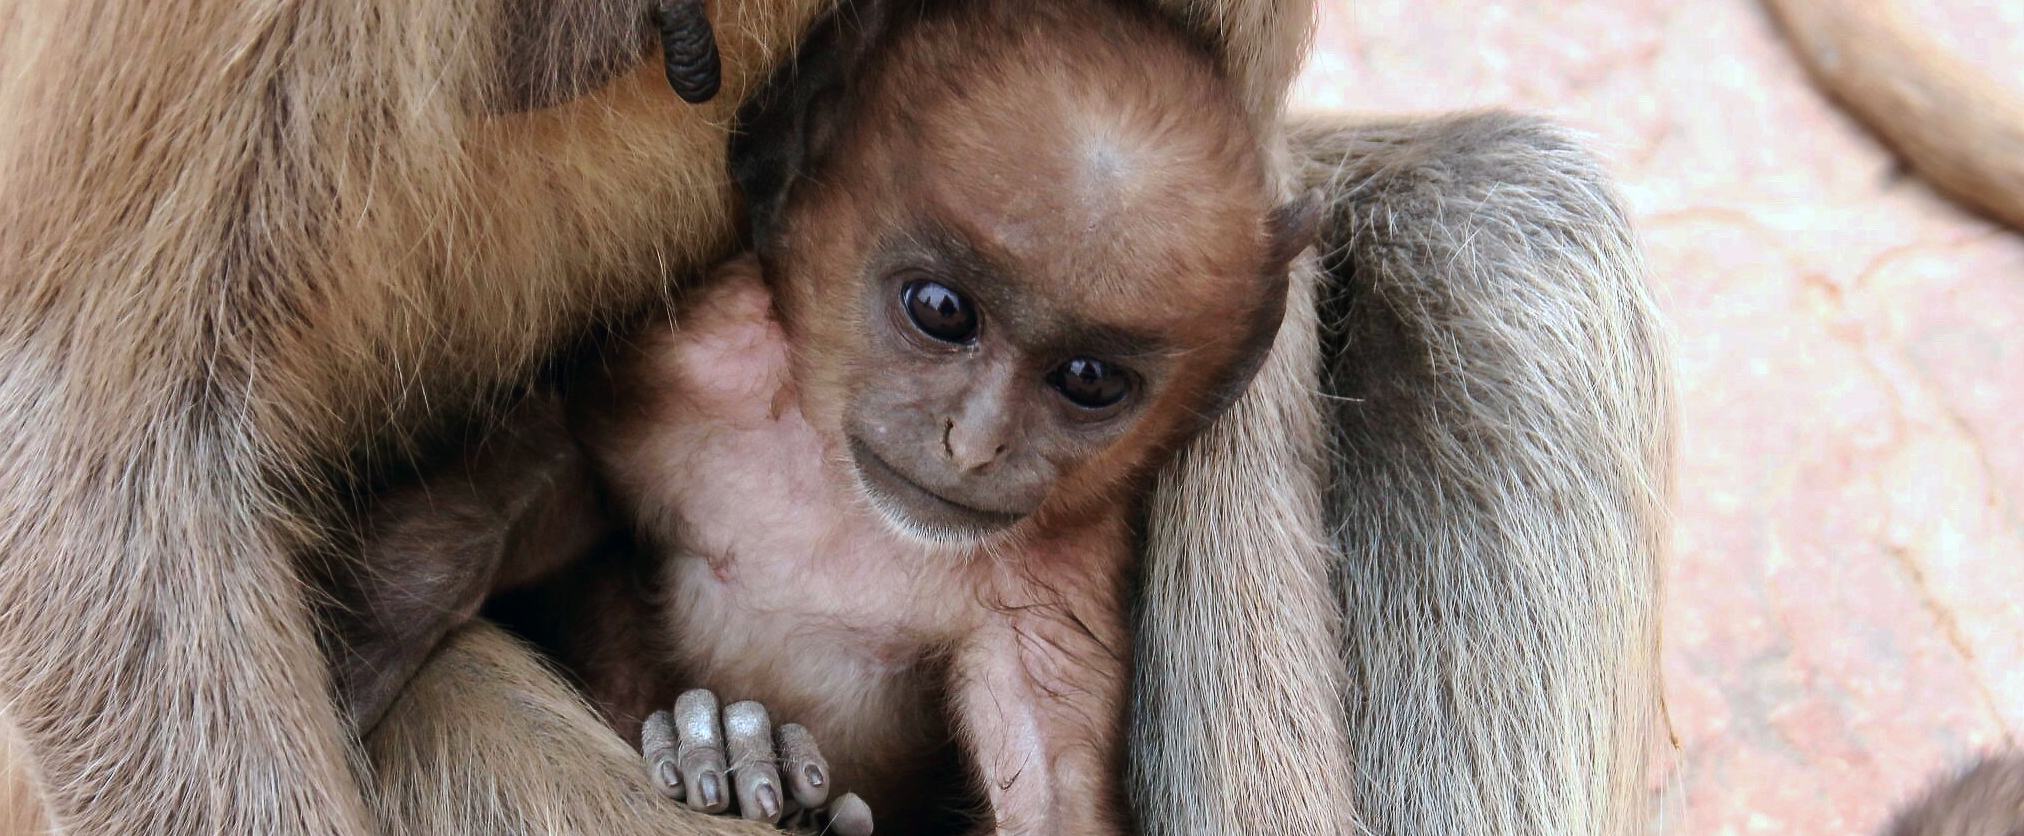 Baby with mom (1) Wmark.jpg